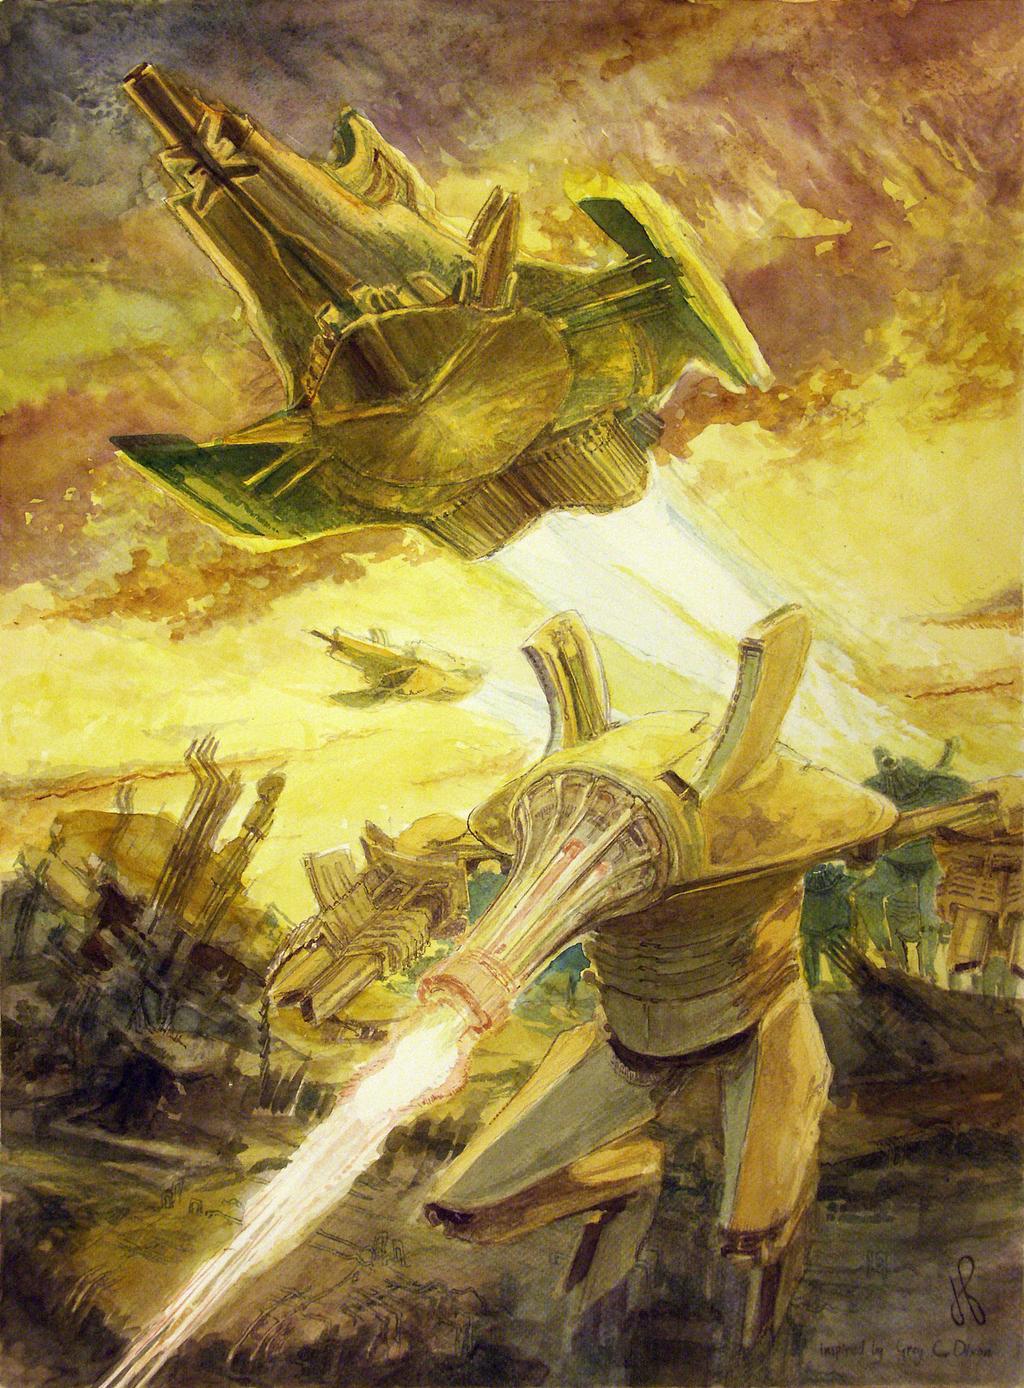 Category one ruin patrol by TheGreatMC